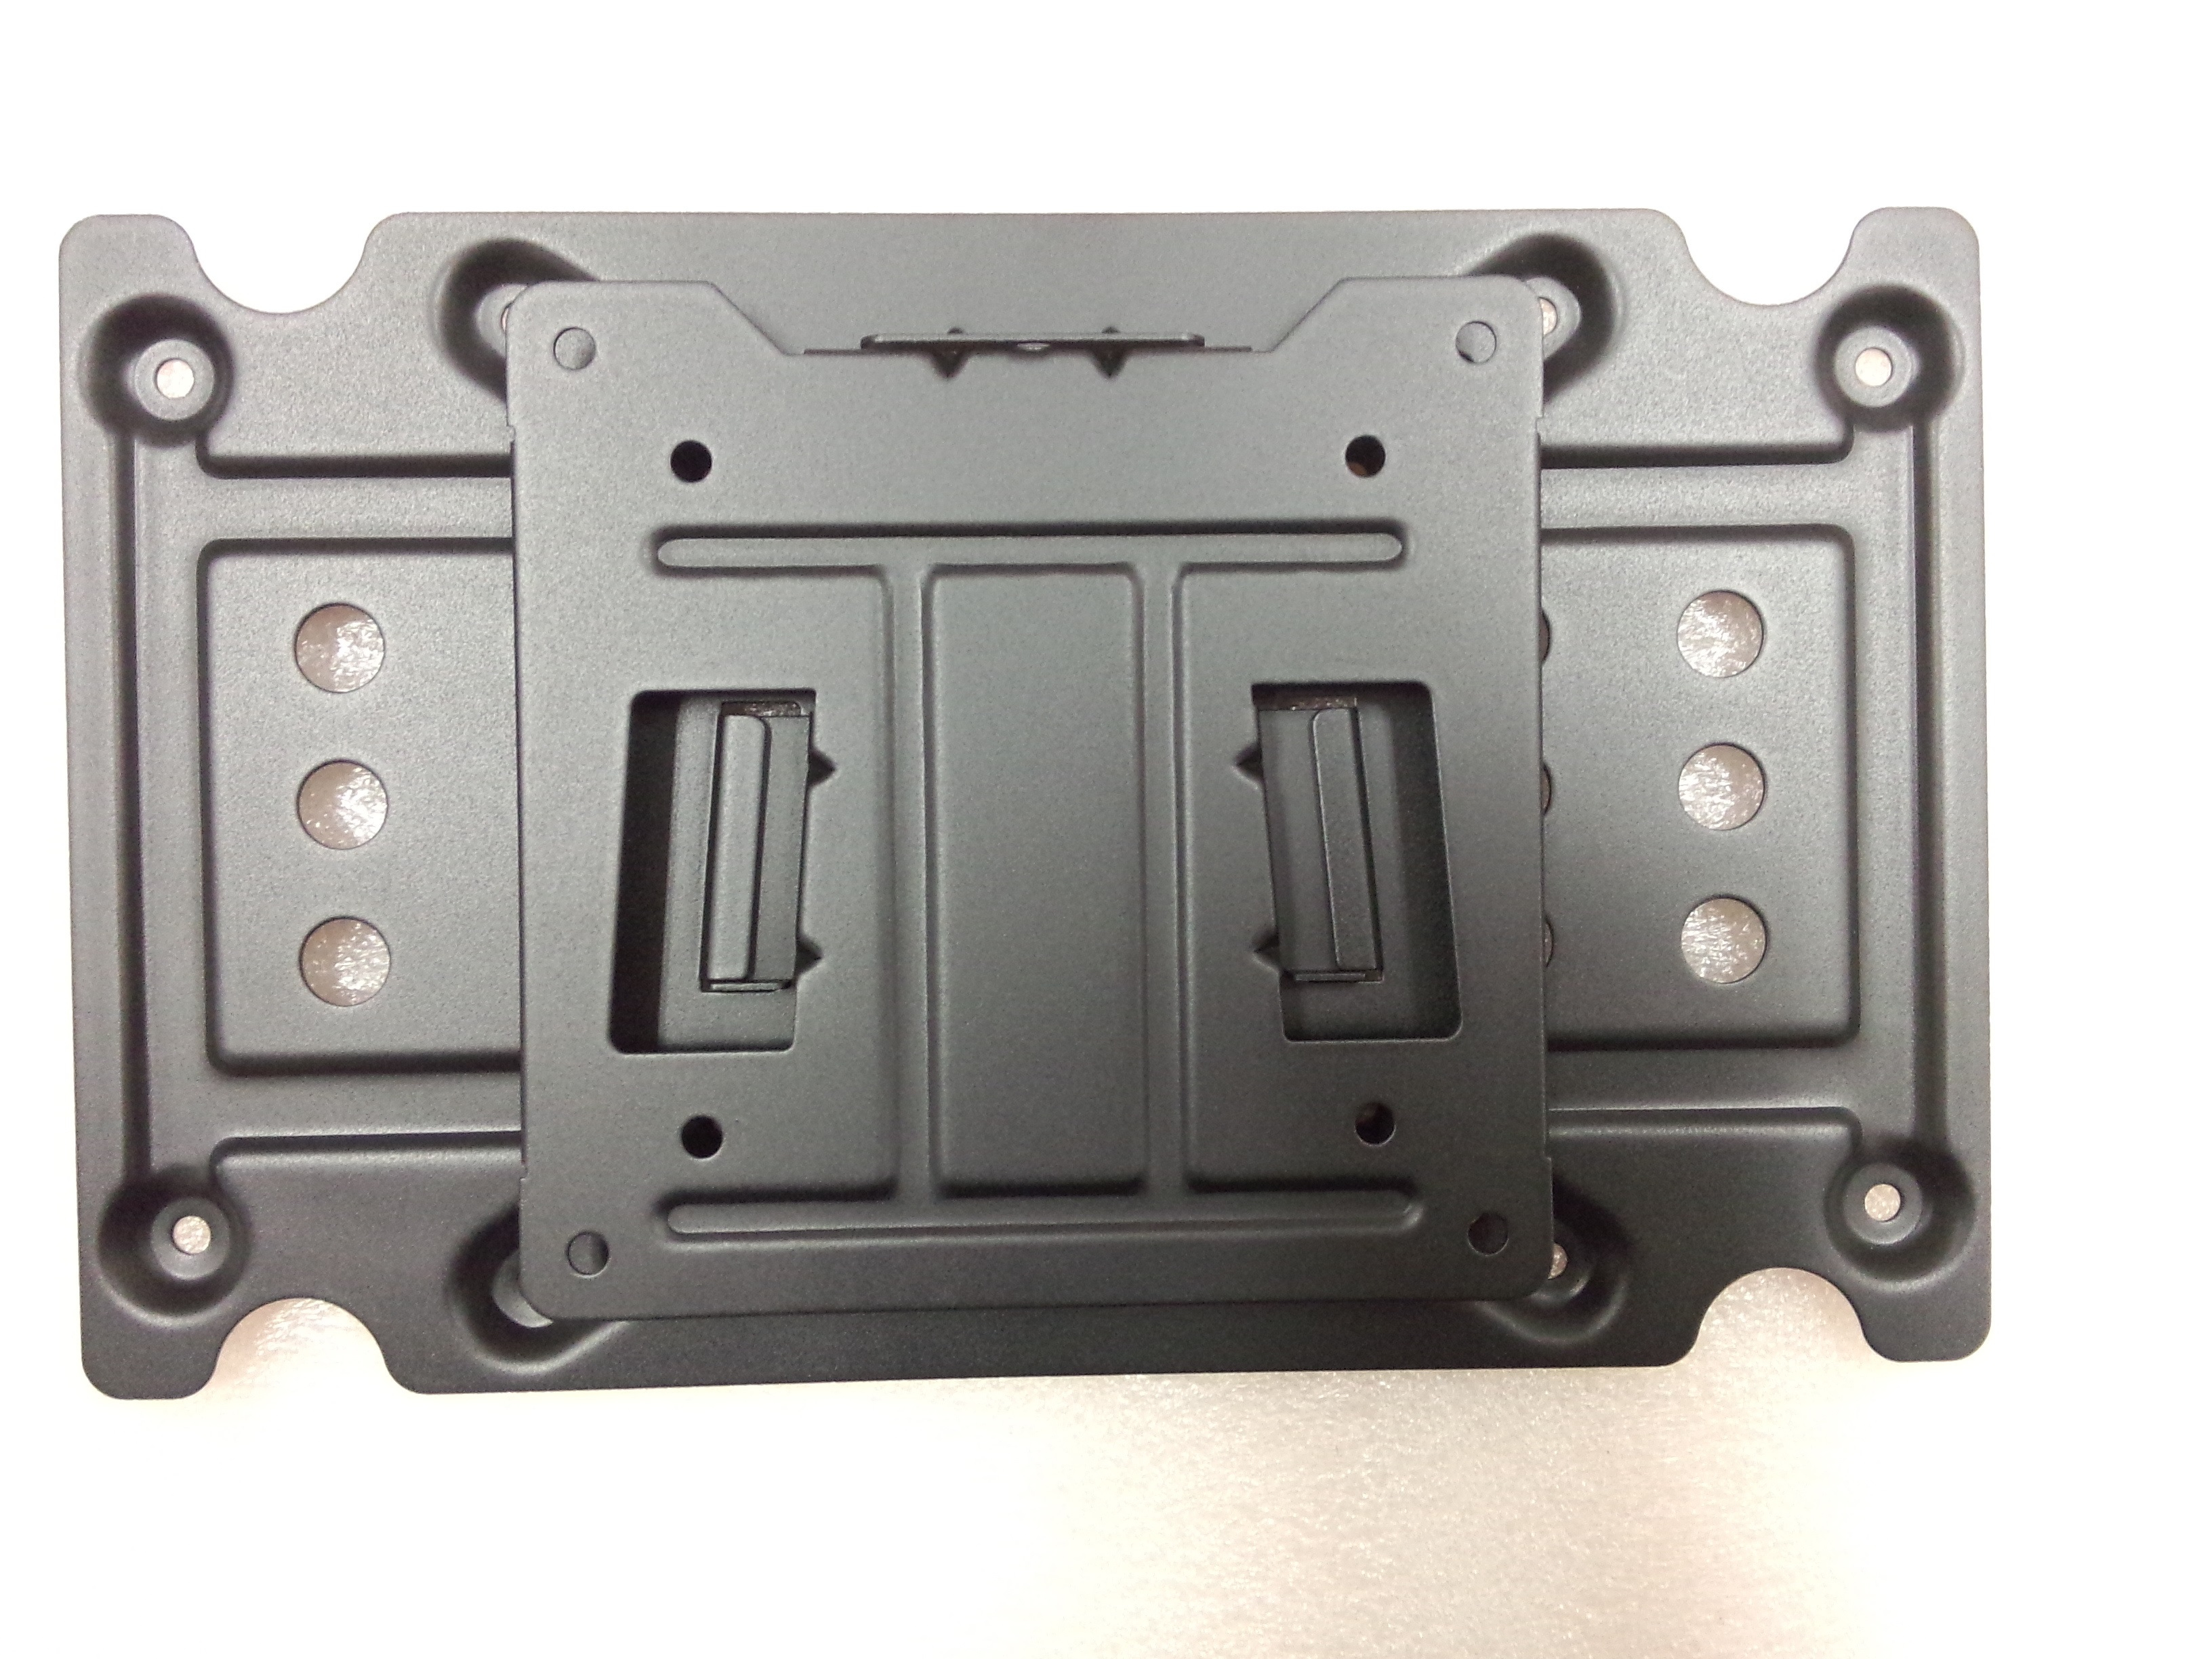 Giada Vesa mount for Q30/Q20/F300/G300/D310/i200